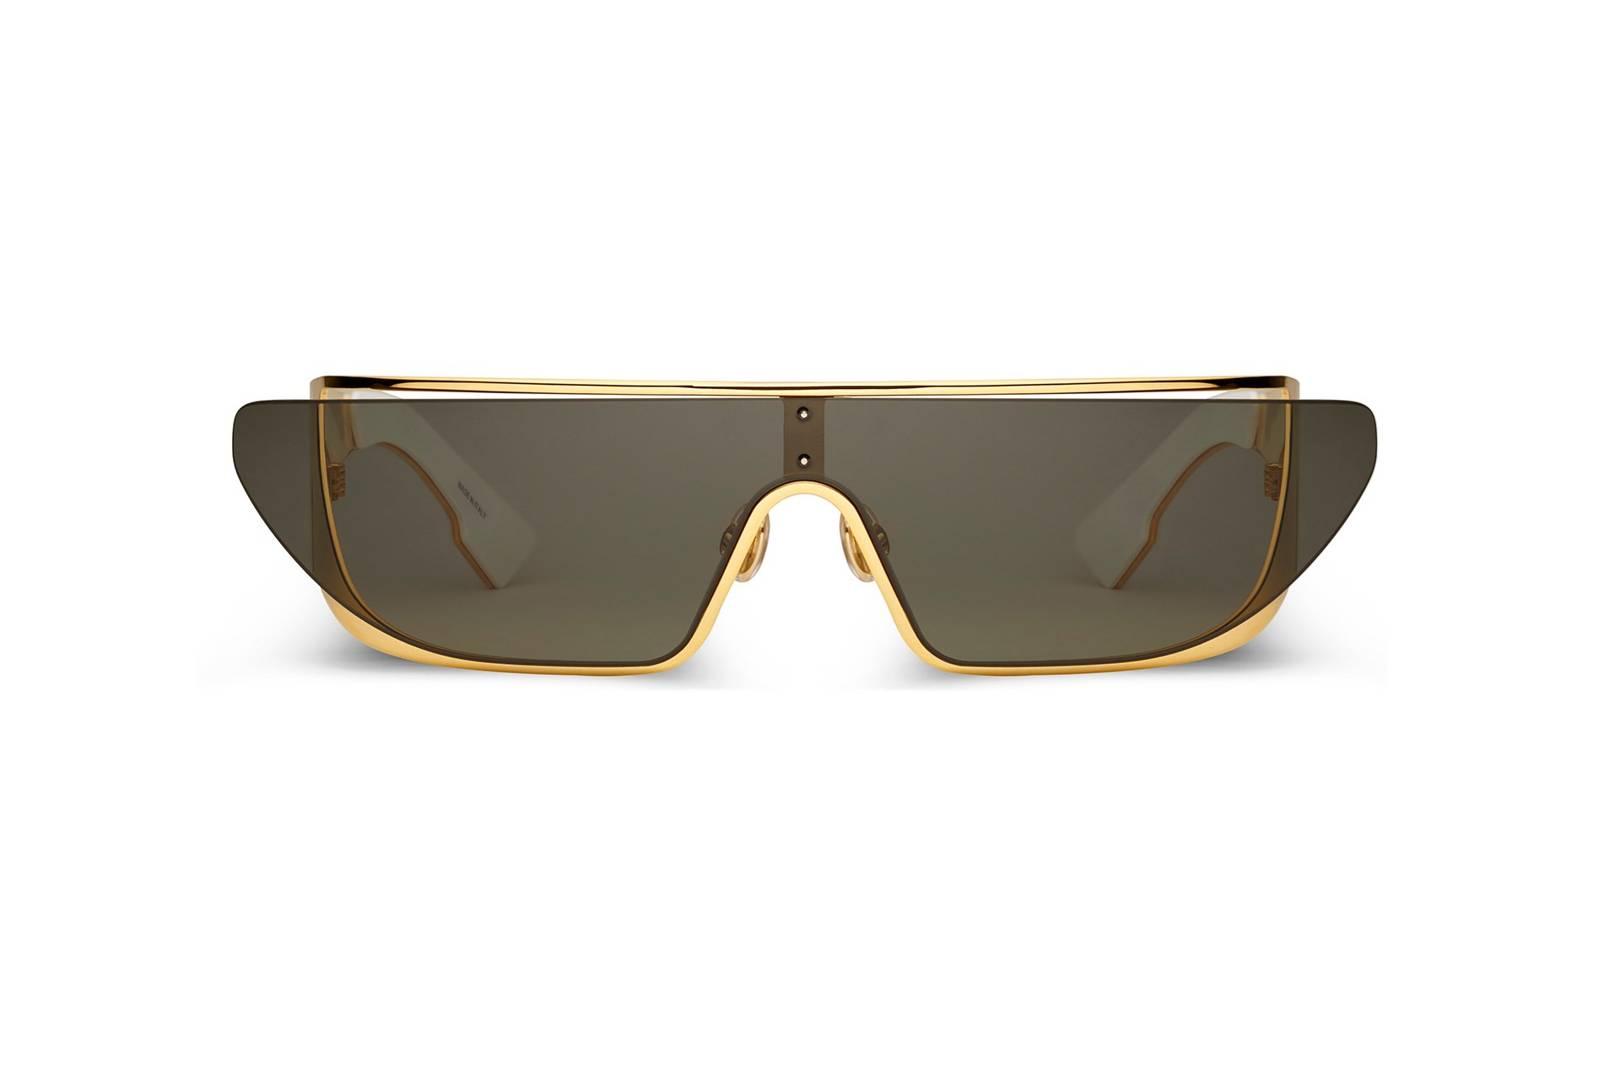 96e0f0e232b2 Rihanna Sunglasses Collaboration Dior